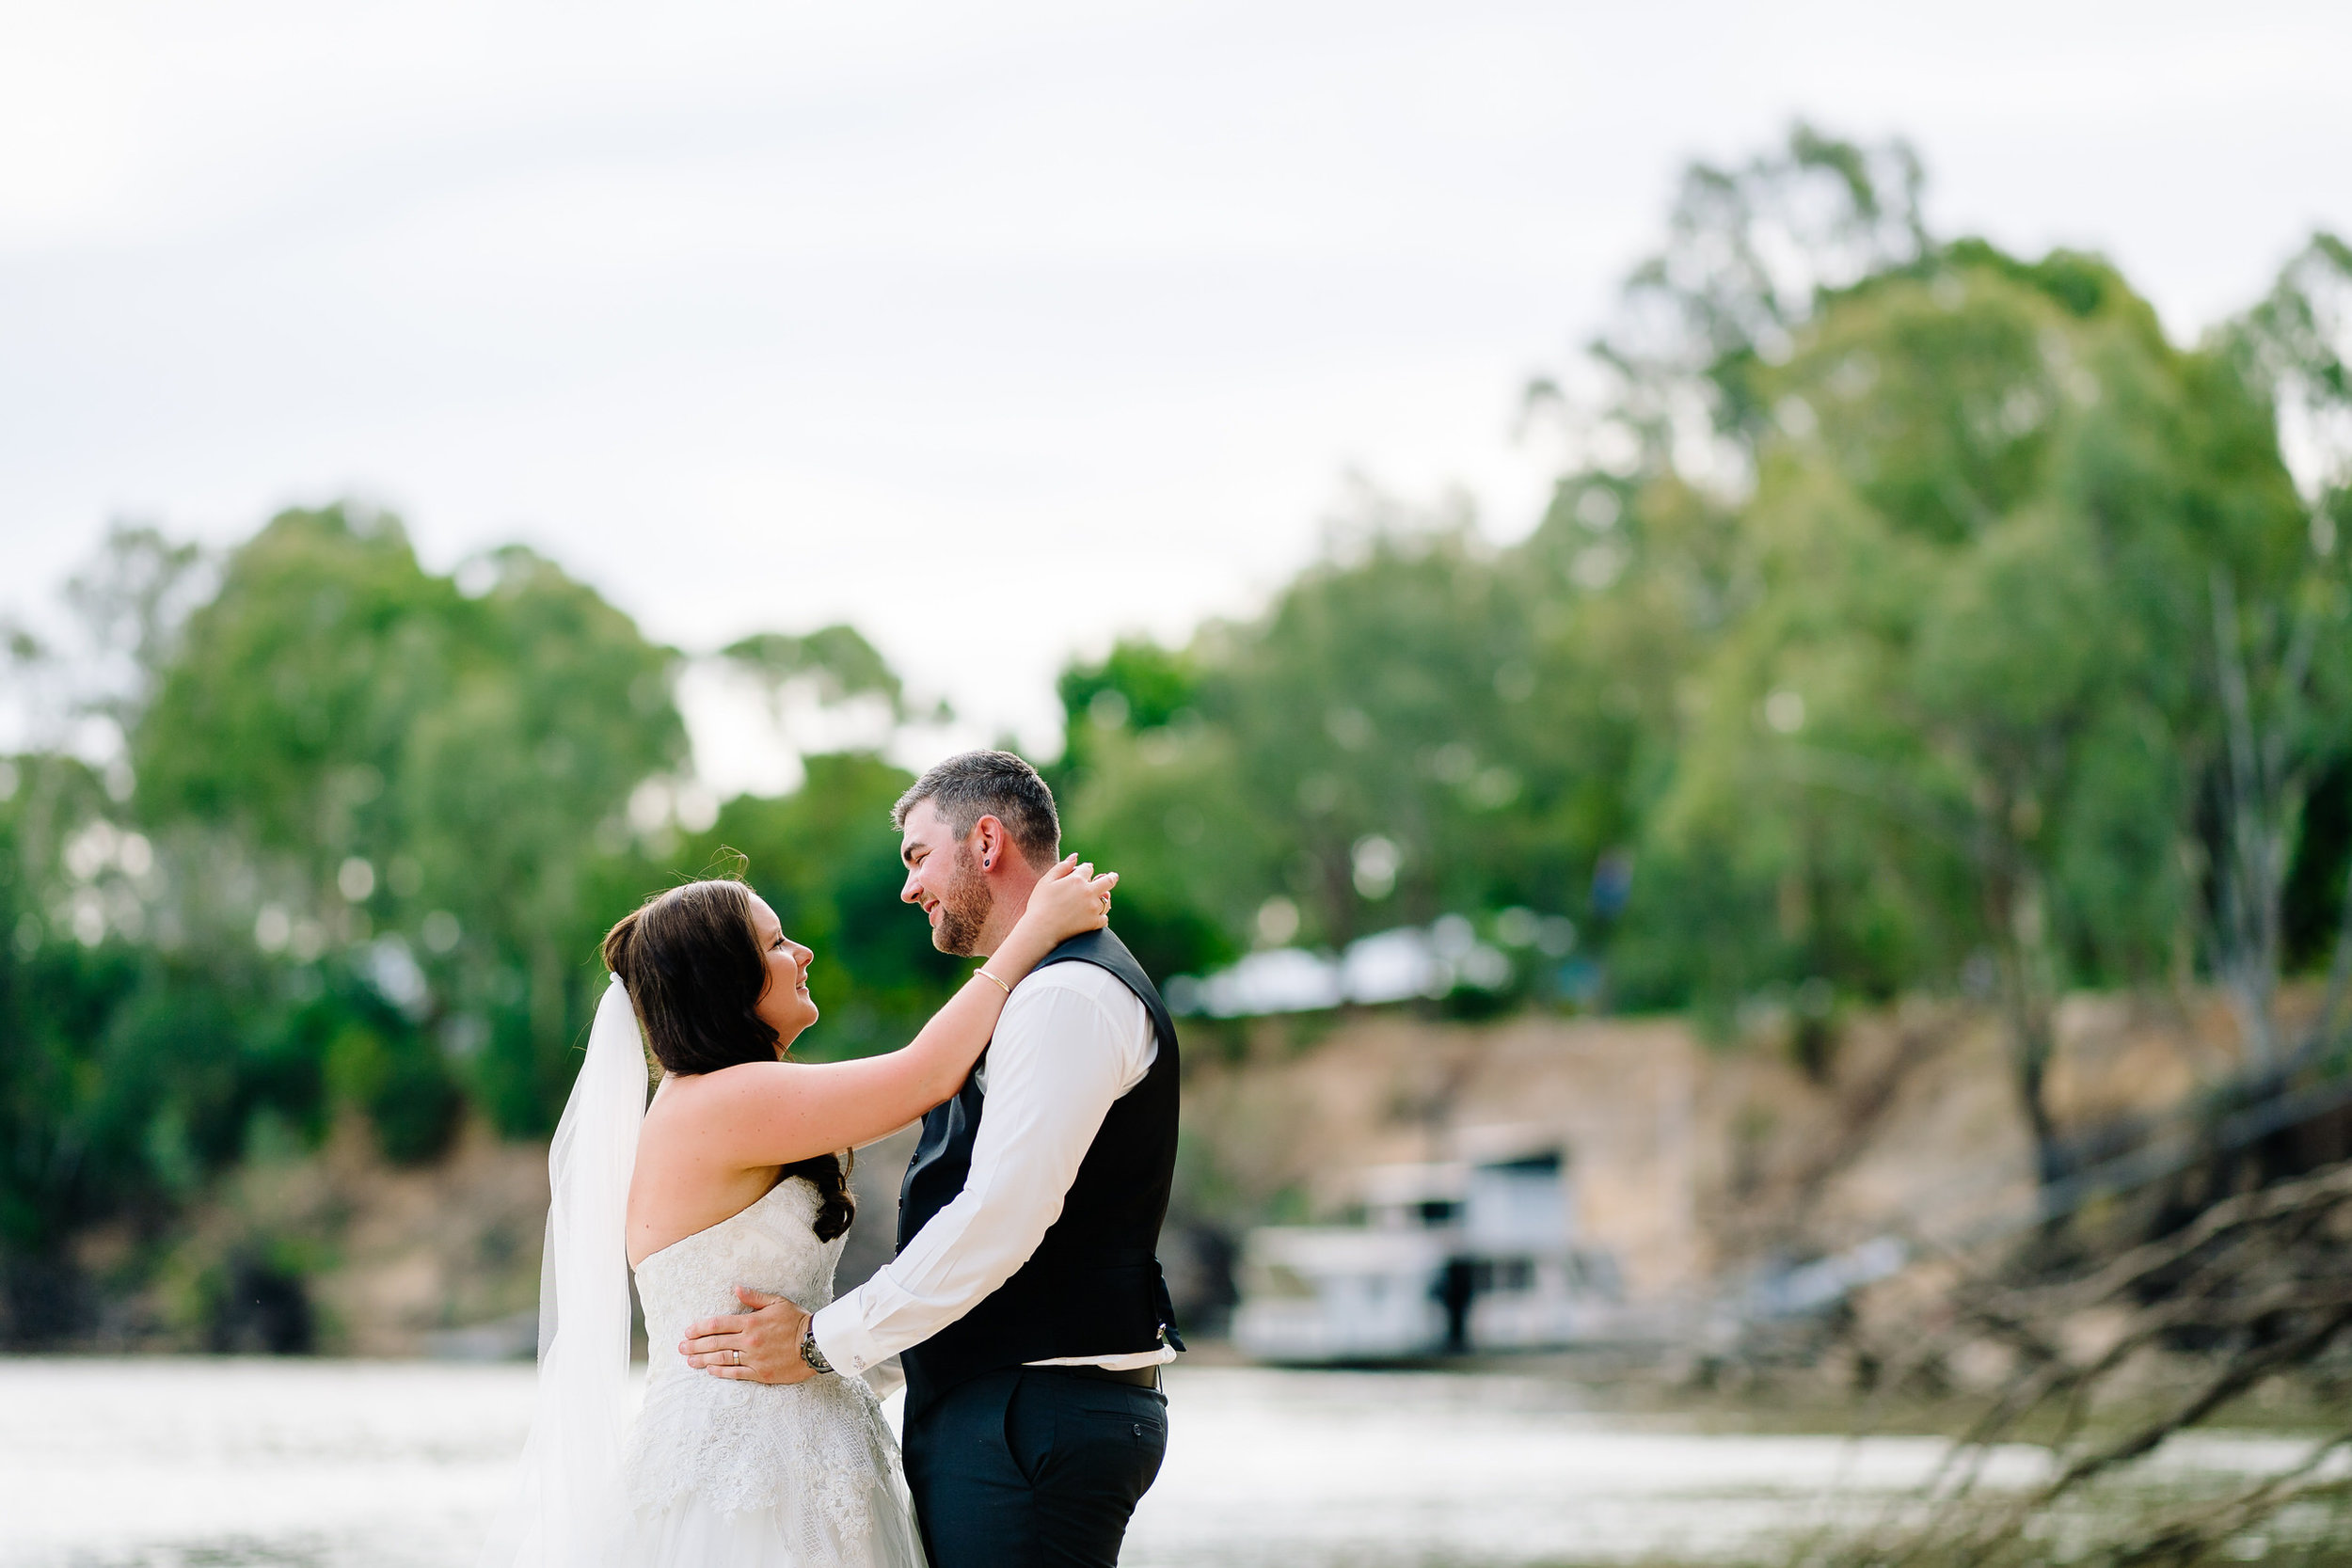 Justin_Jim_Echuca_Wedding_Photography_Tindarra-233.JPG